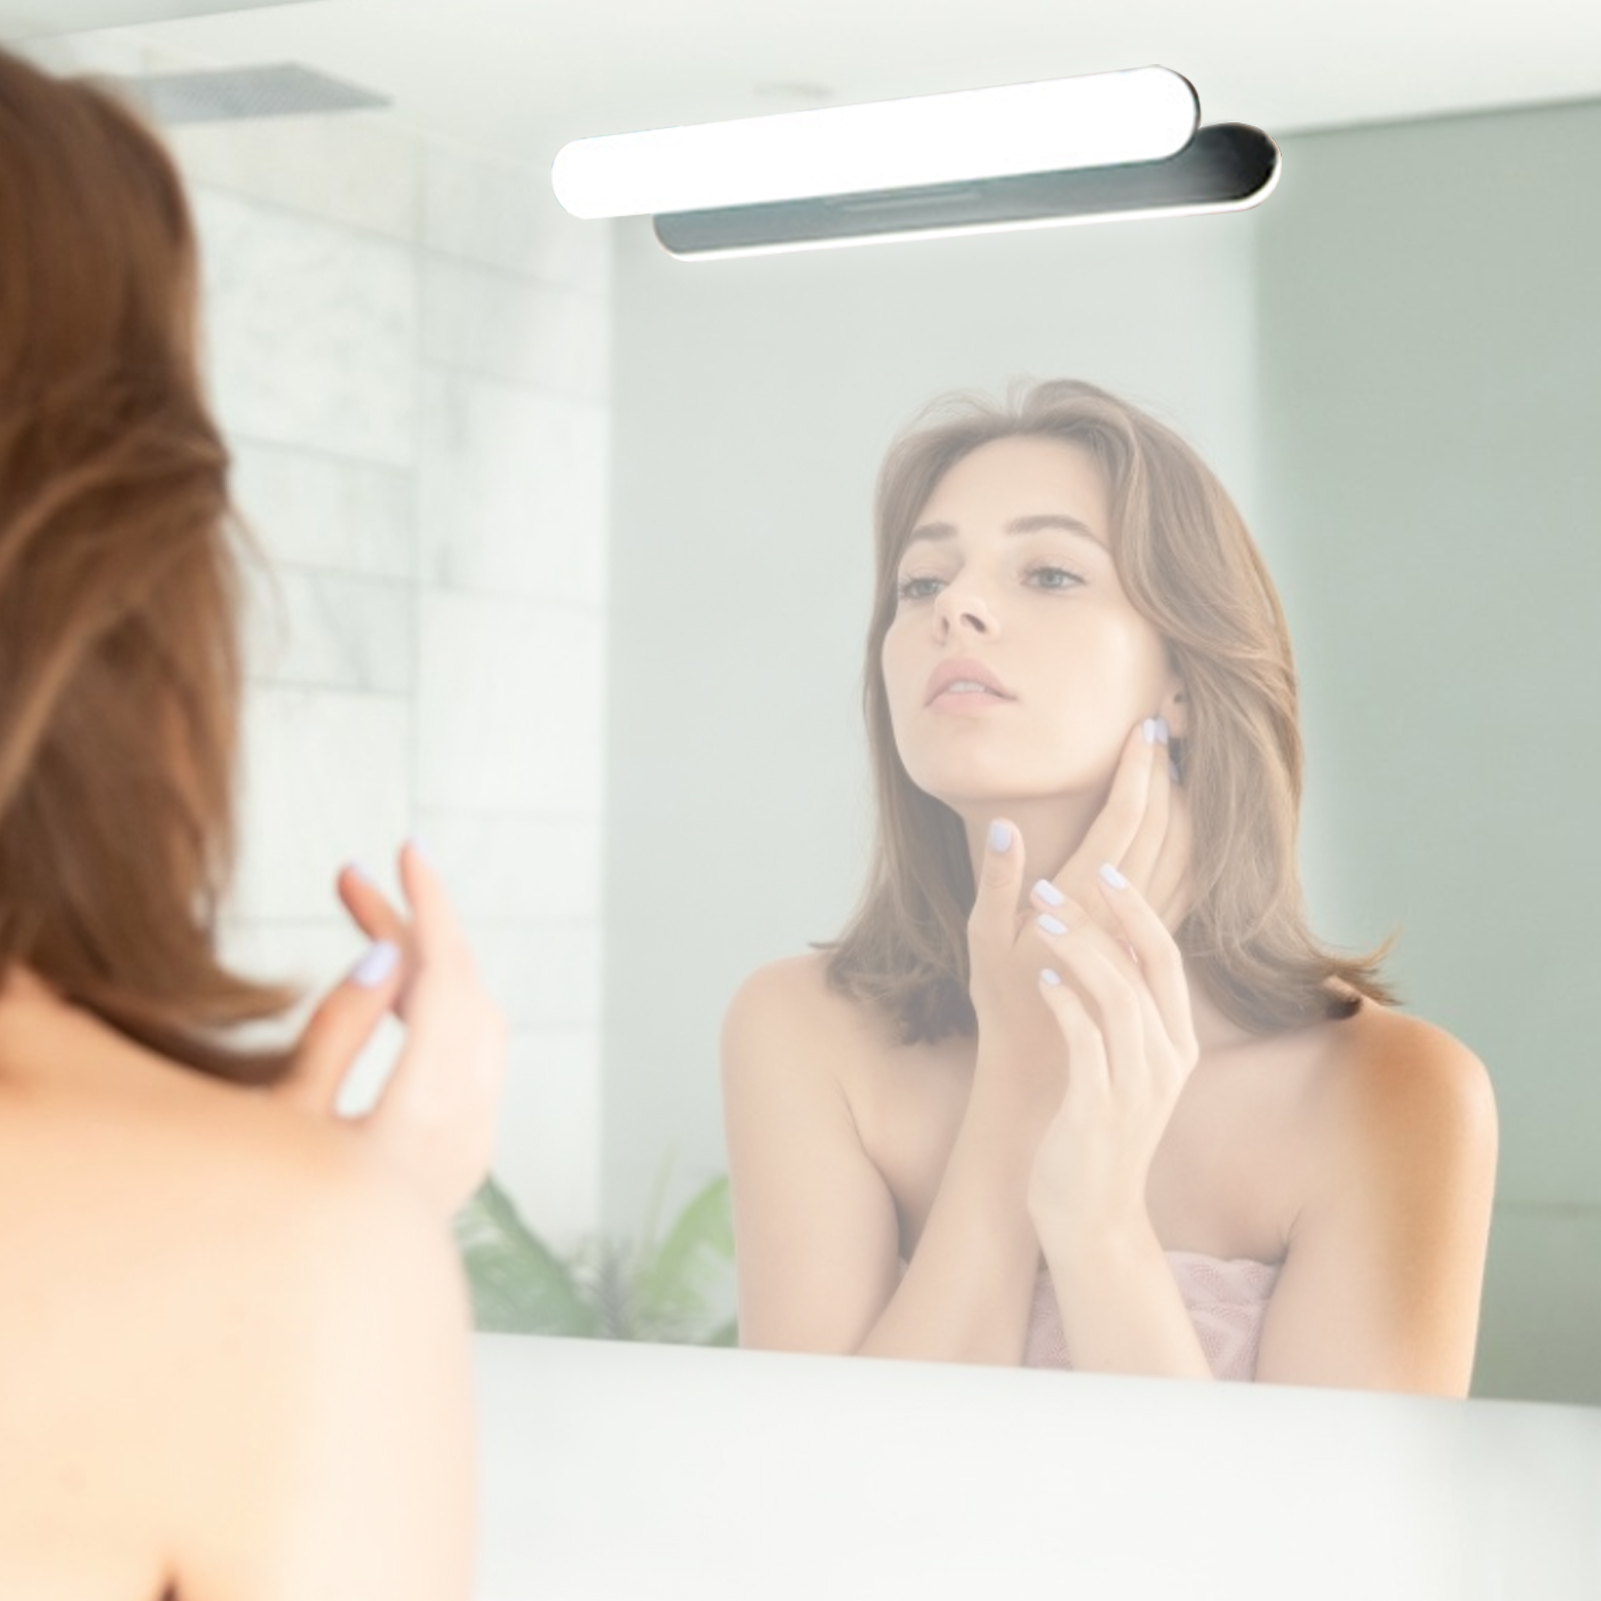 LED Wall Light Makeup Mirror Lights Led Vanity Lights Cabinet Lamp Bathroom Rechargeable Bathroom Dressing Lamp